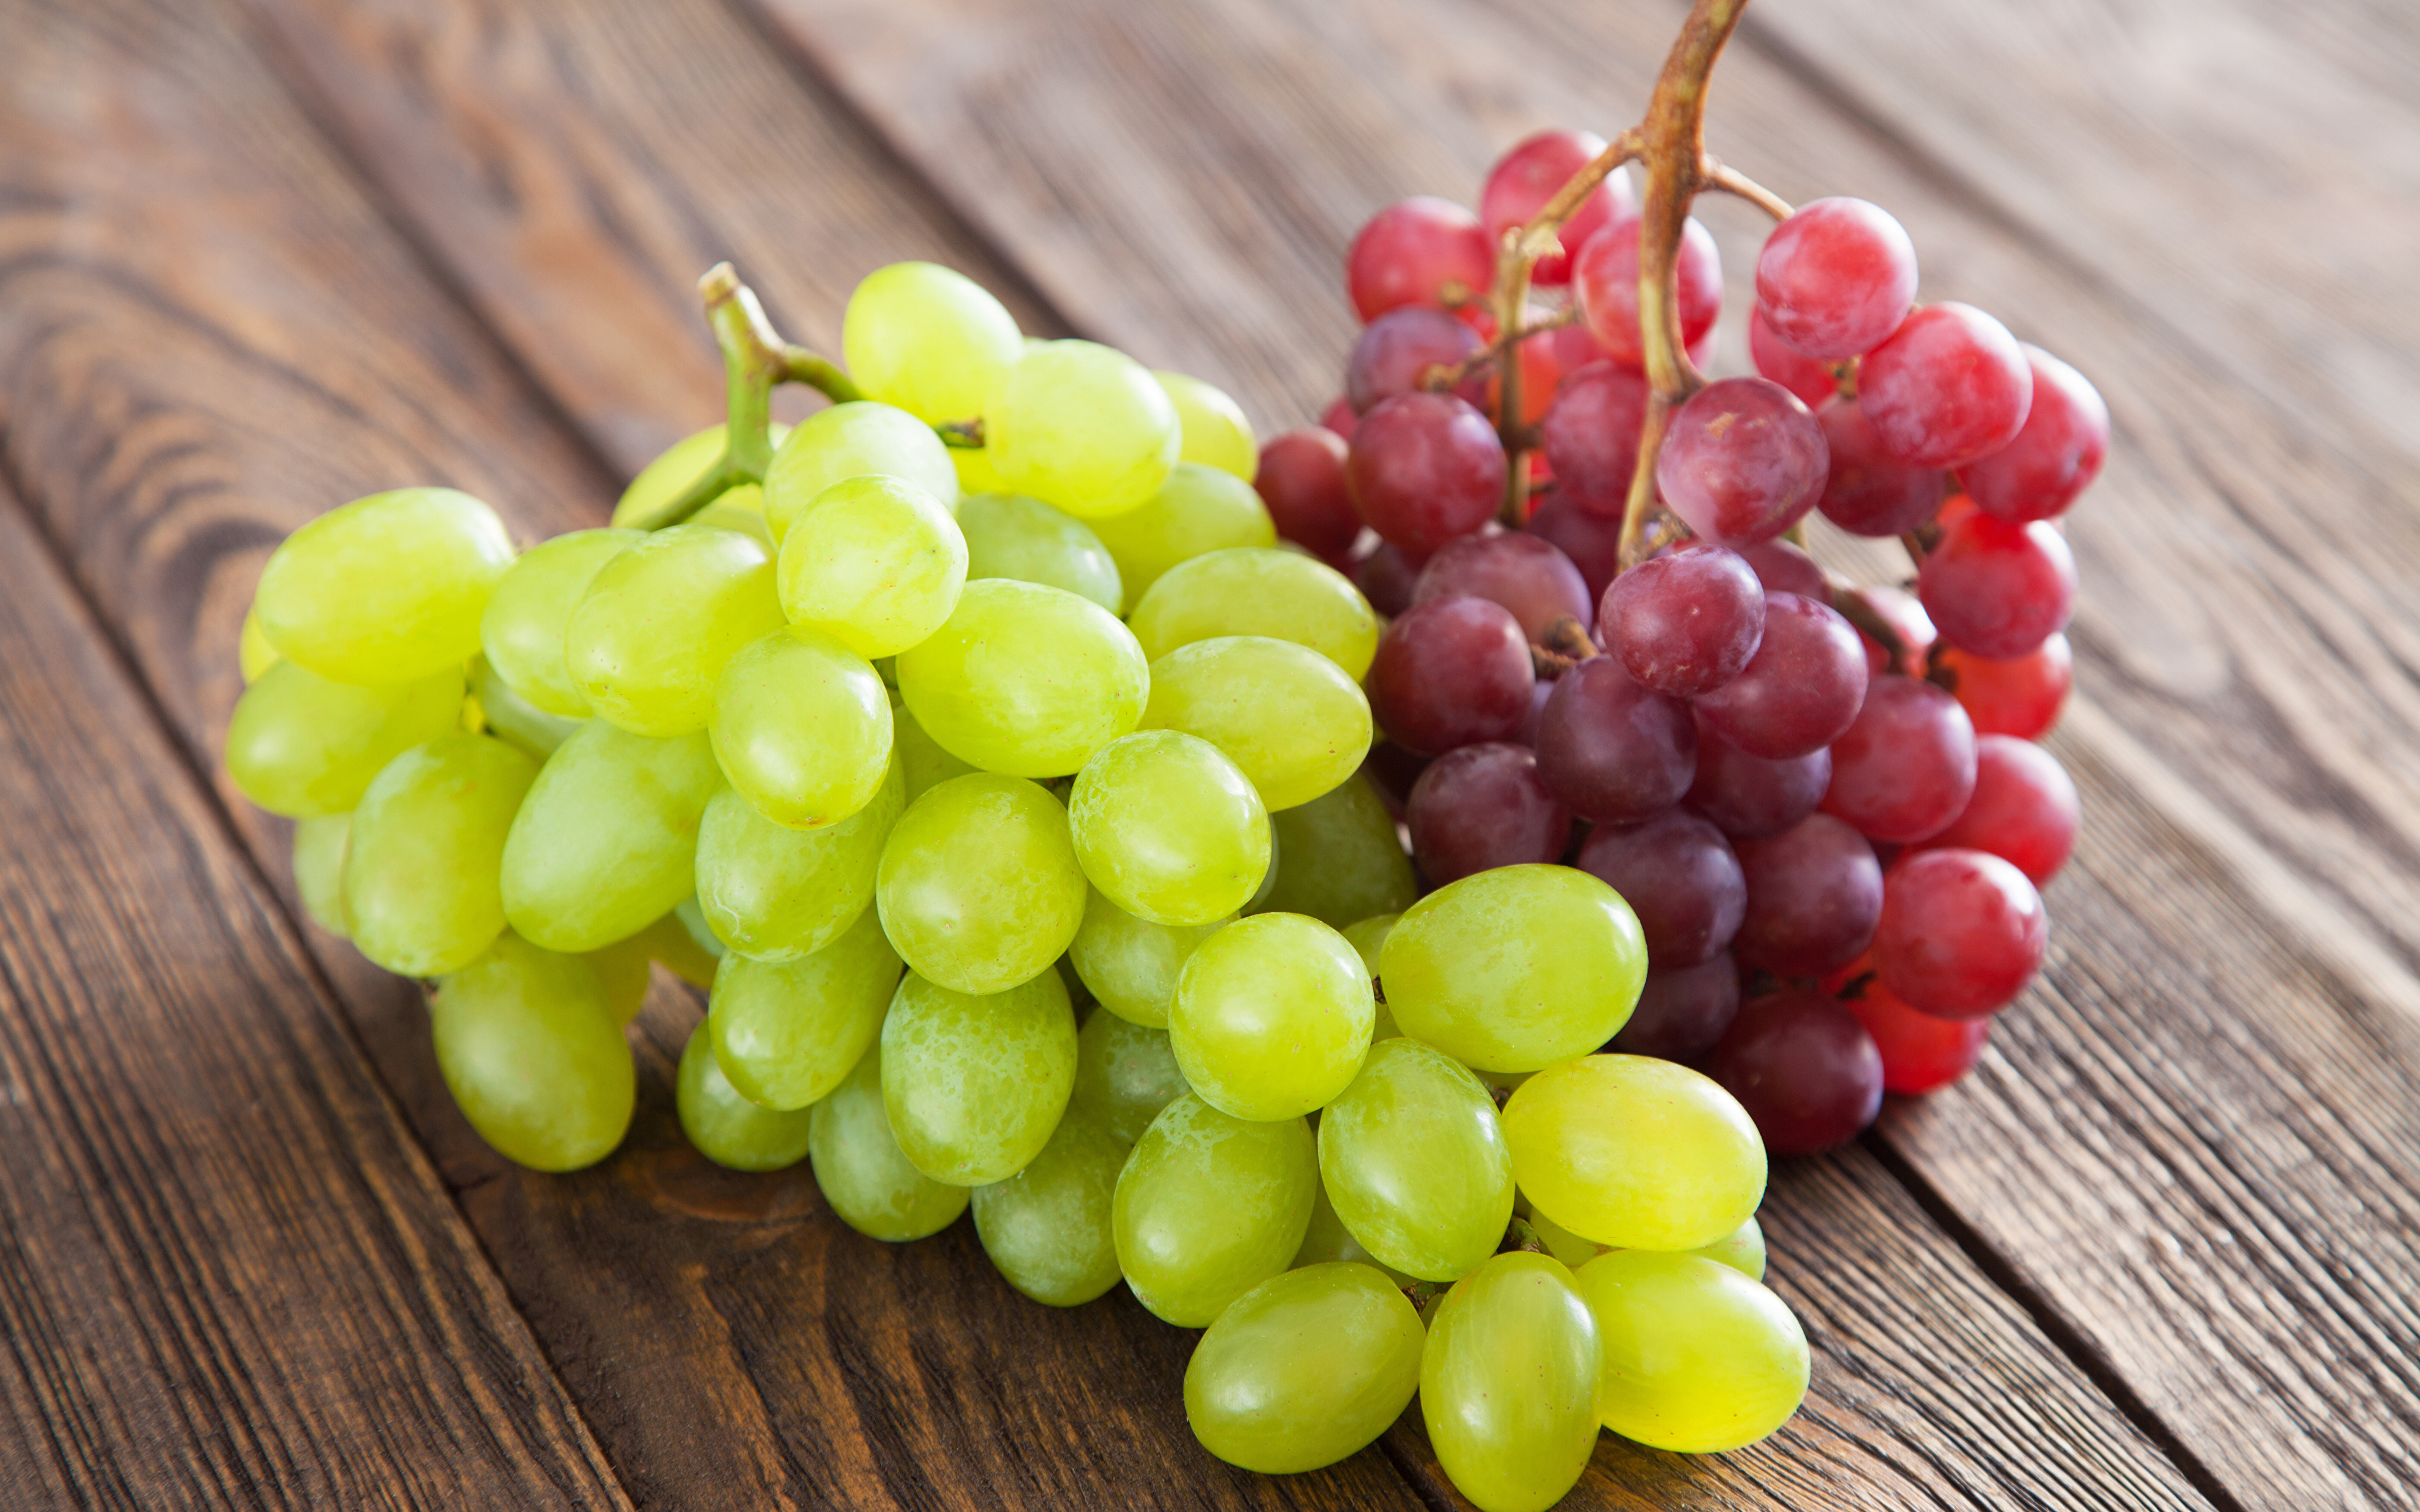 еда виноград food grapes бесплатно